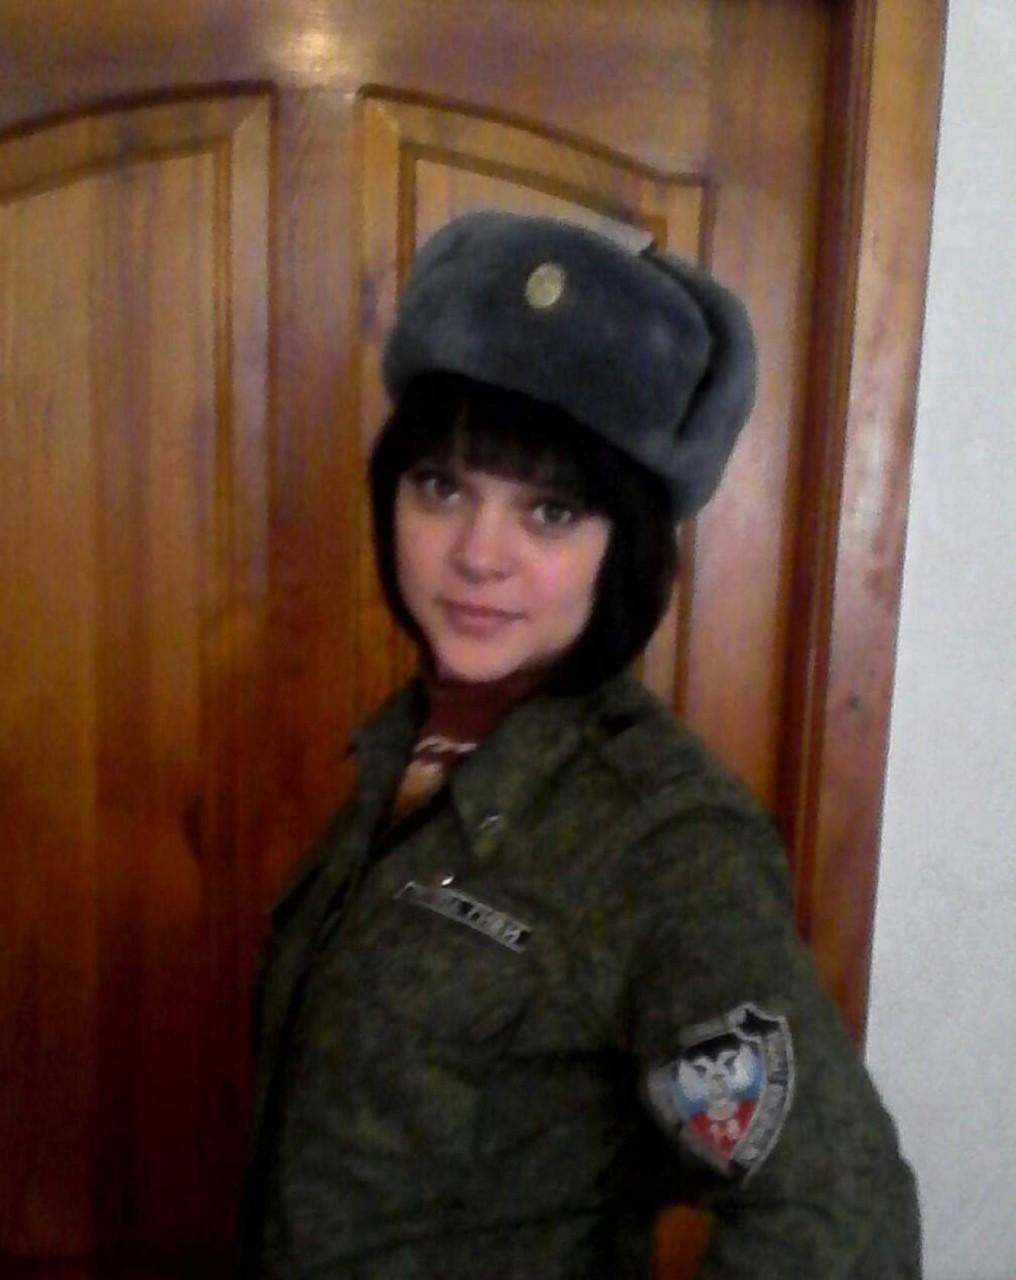 Радуетесь, украиньцы? Зря.